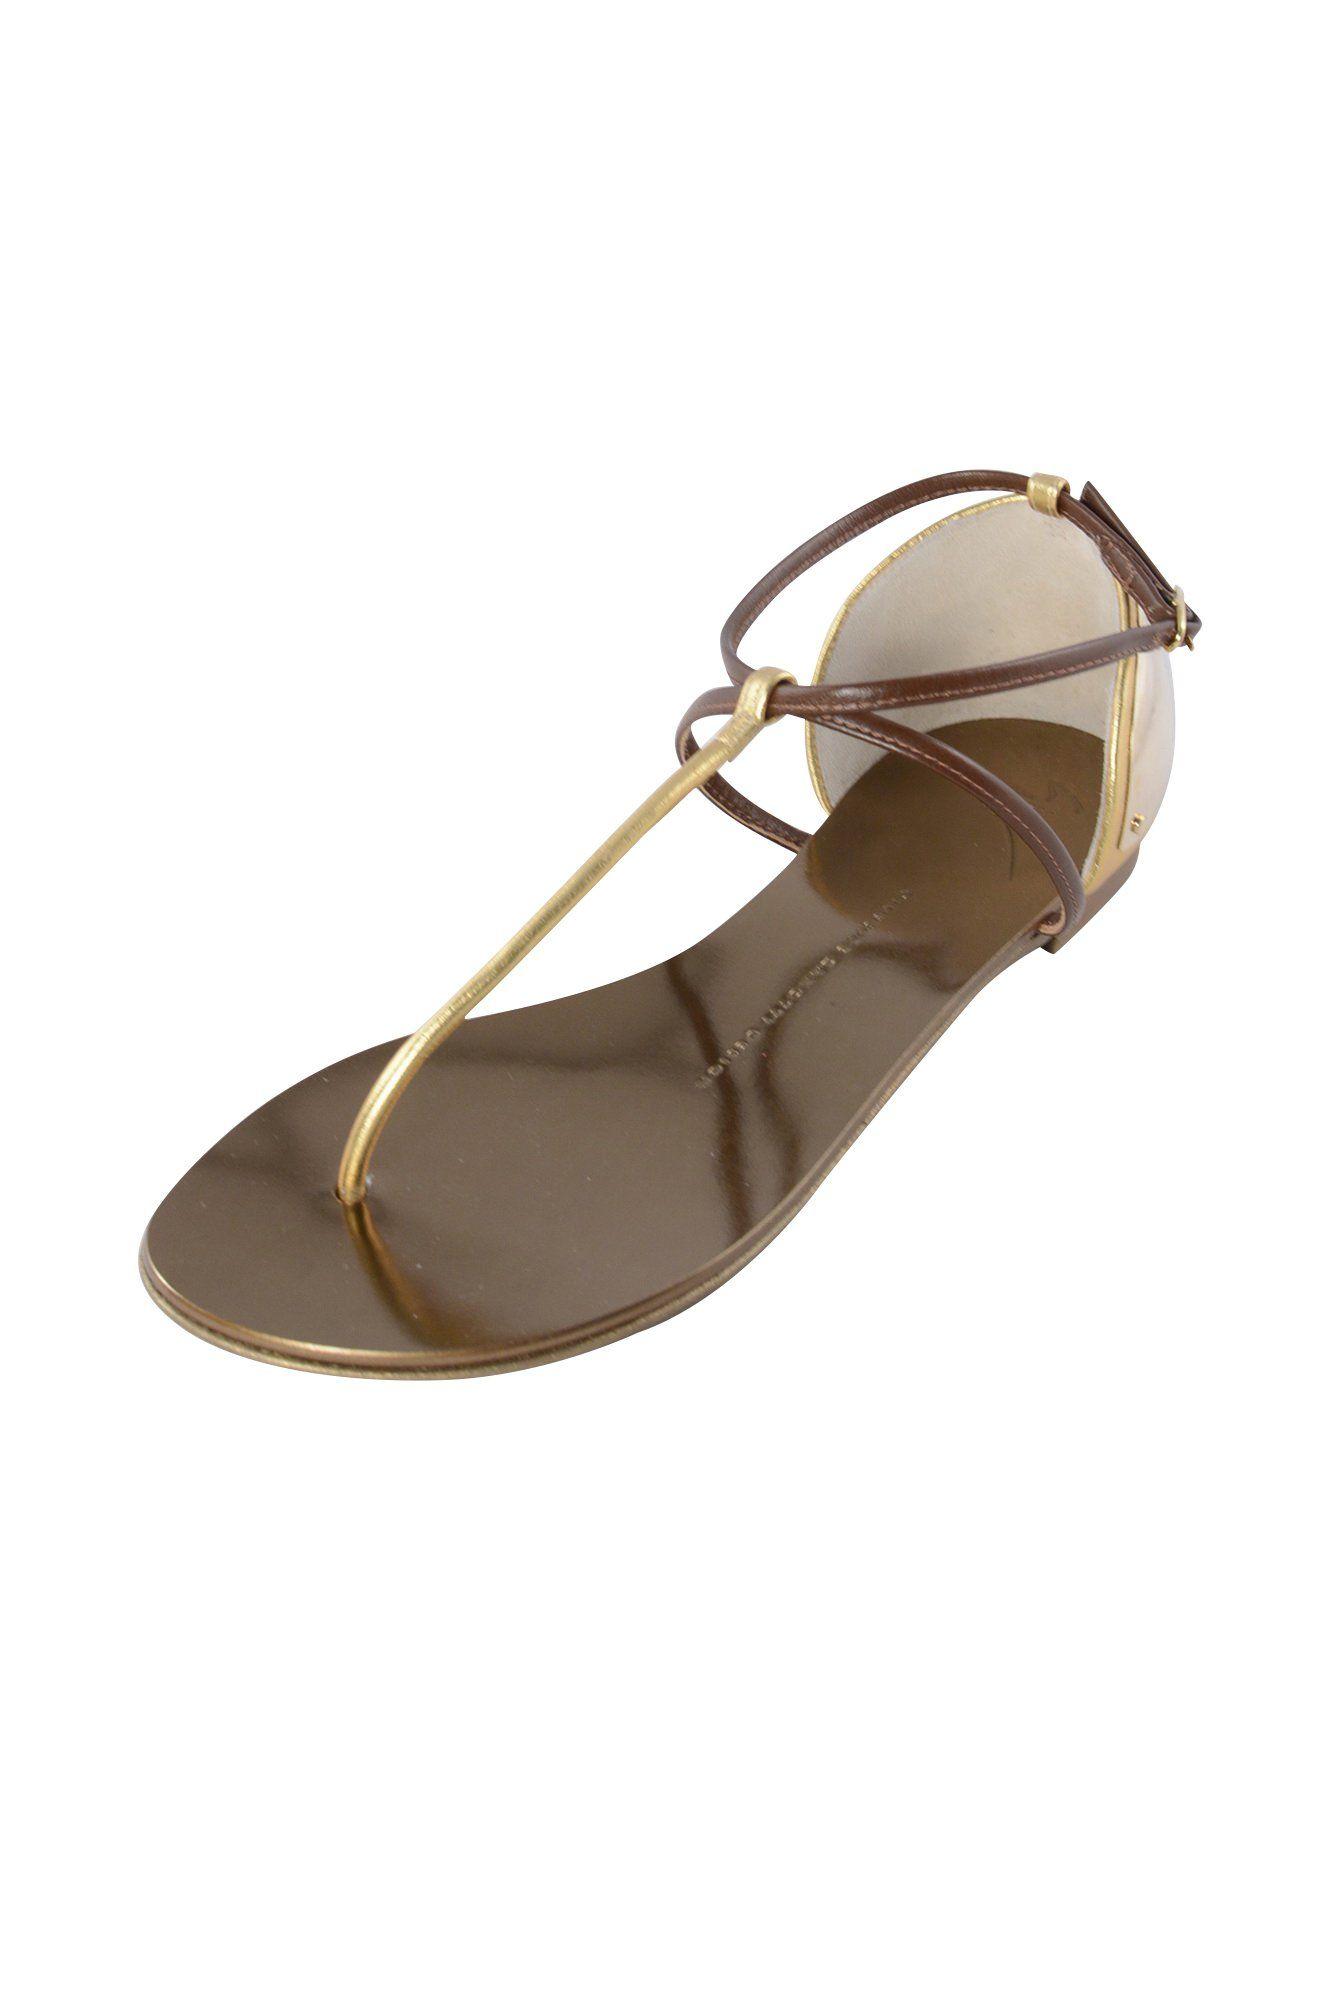 Giuseppe Zanotti Womens Oro Gold Rock 10 Tallone T-Strap Sandals 37. Rock 10 Tallone. Giuseppe Zanotti Design.